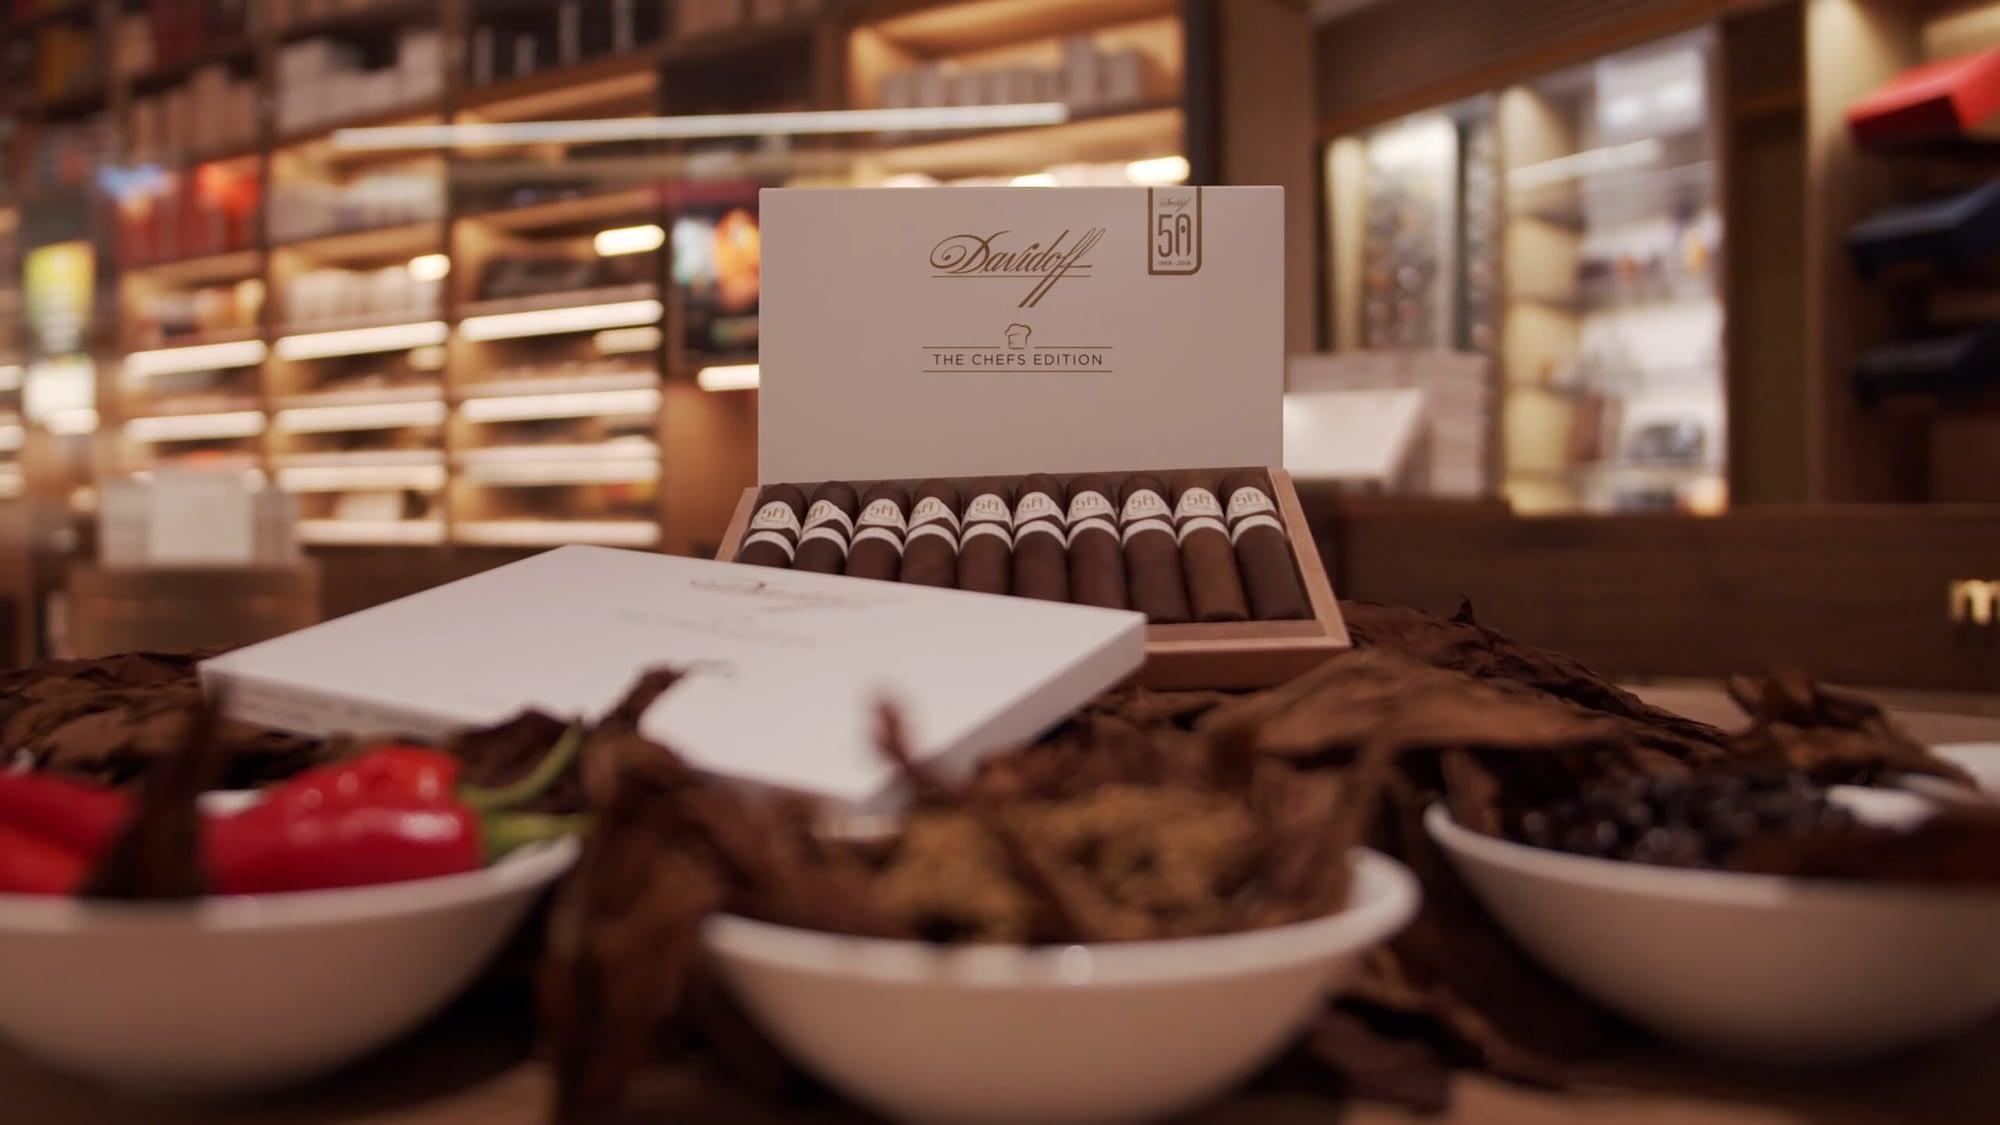 Davidoff-Cigars-Chef-edition-in-Per-Se-New-York-vidconverter.co_.webm_snapshot_01.31